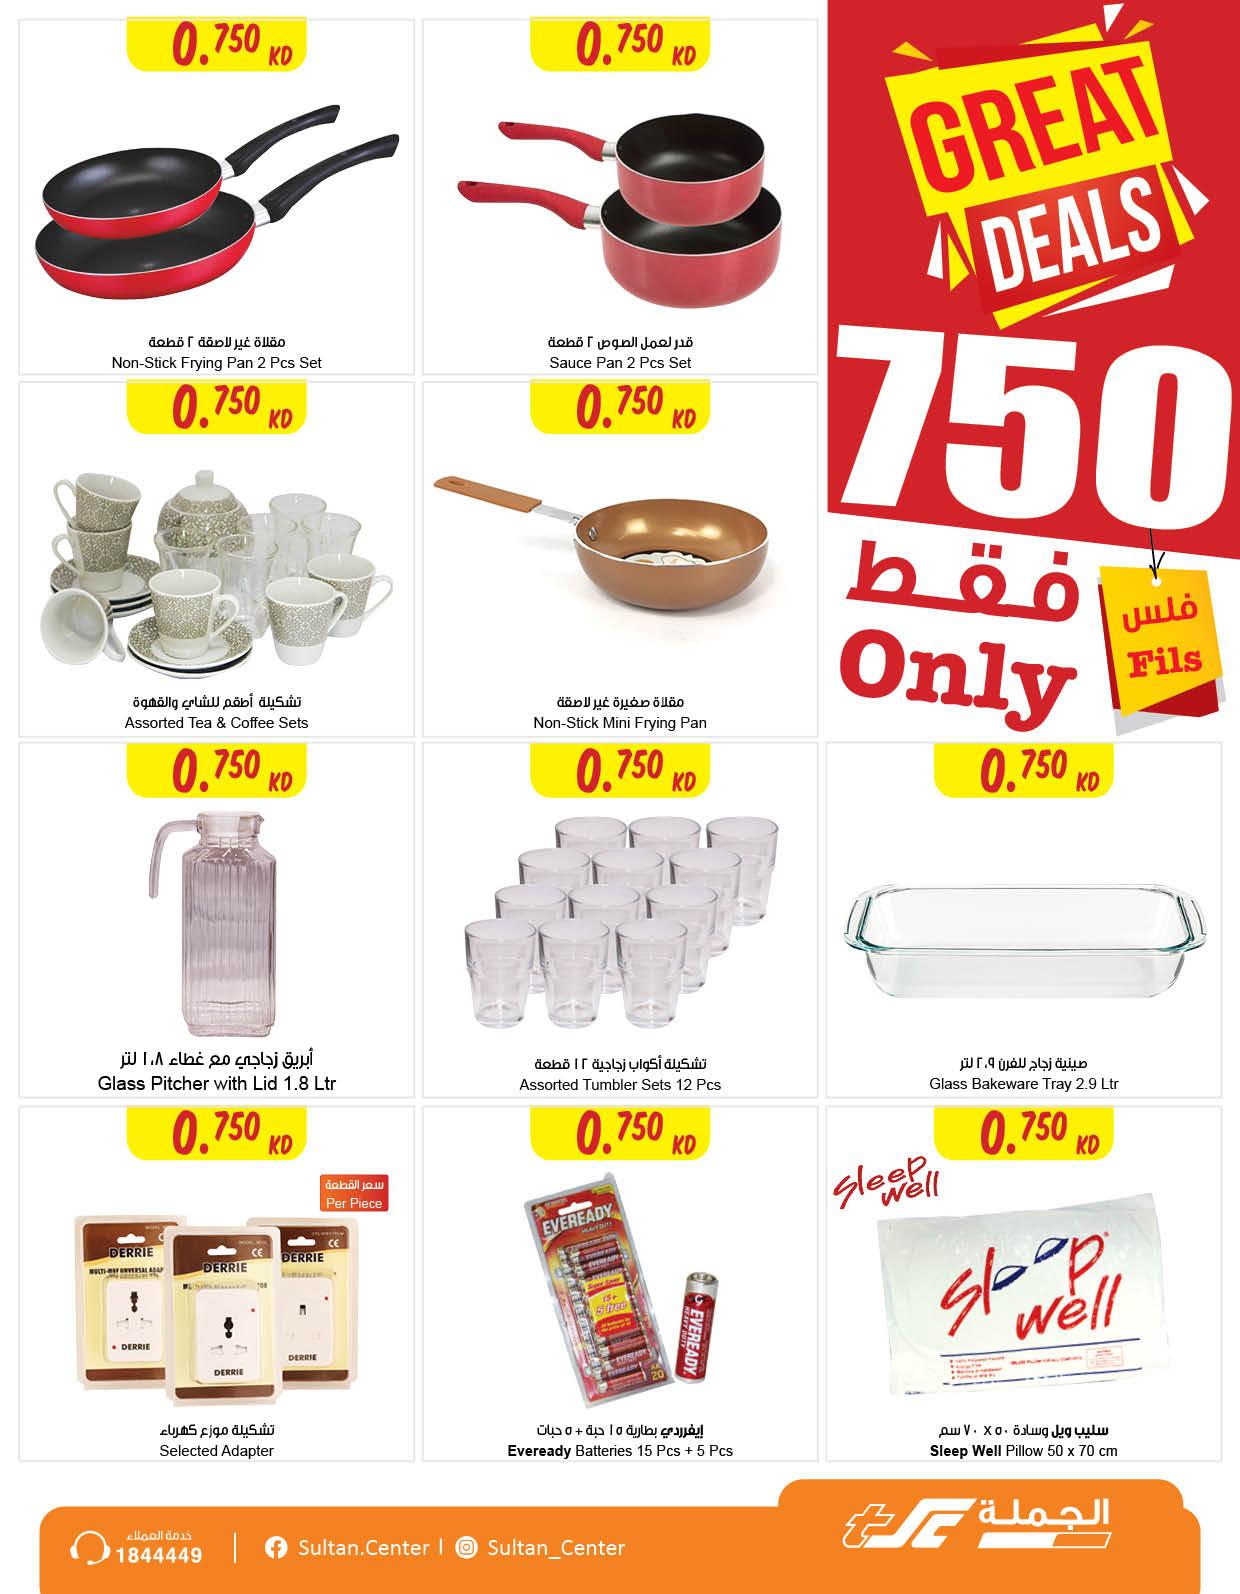 Sultan Center Weekly promotions, iiQ8, Deals in Sultan Centre Kuwait Jan 2021 8